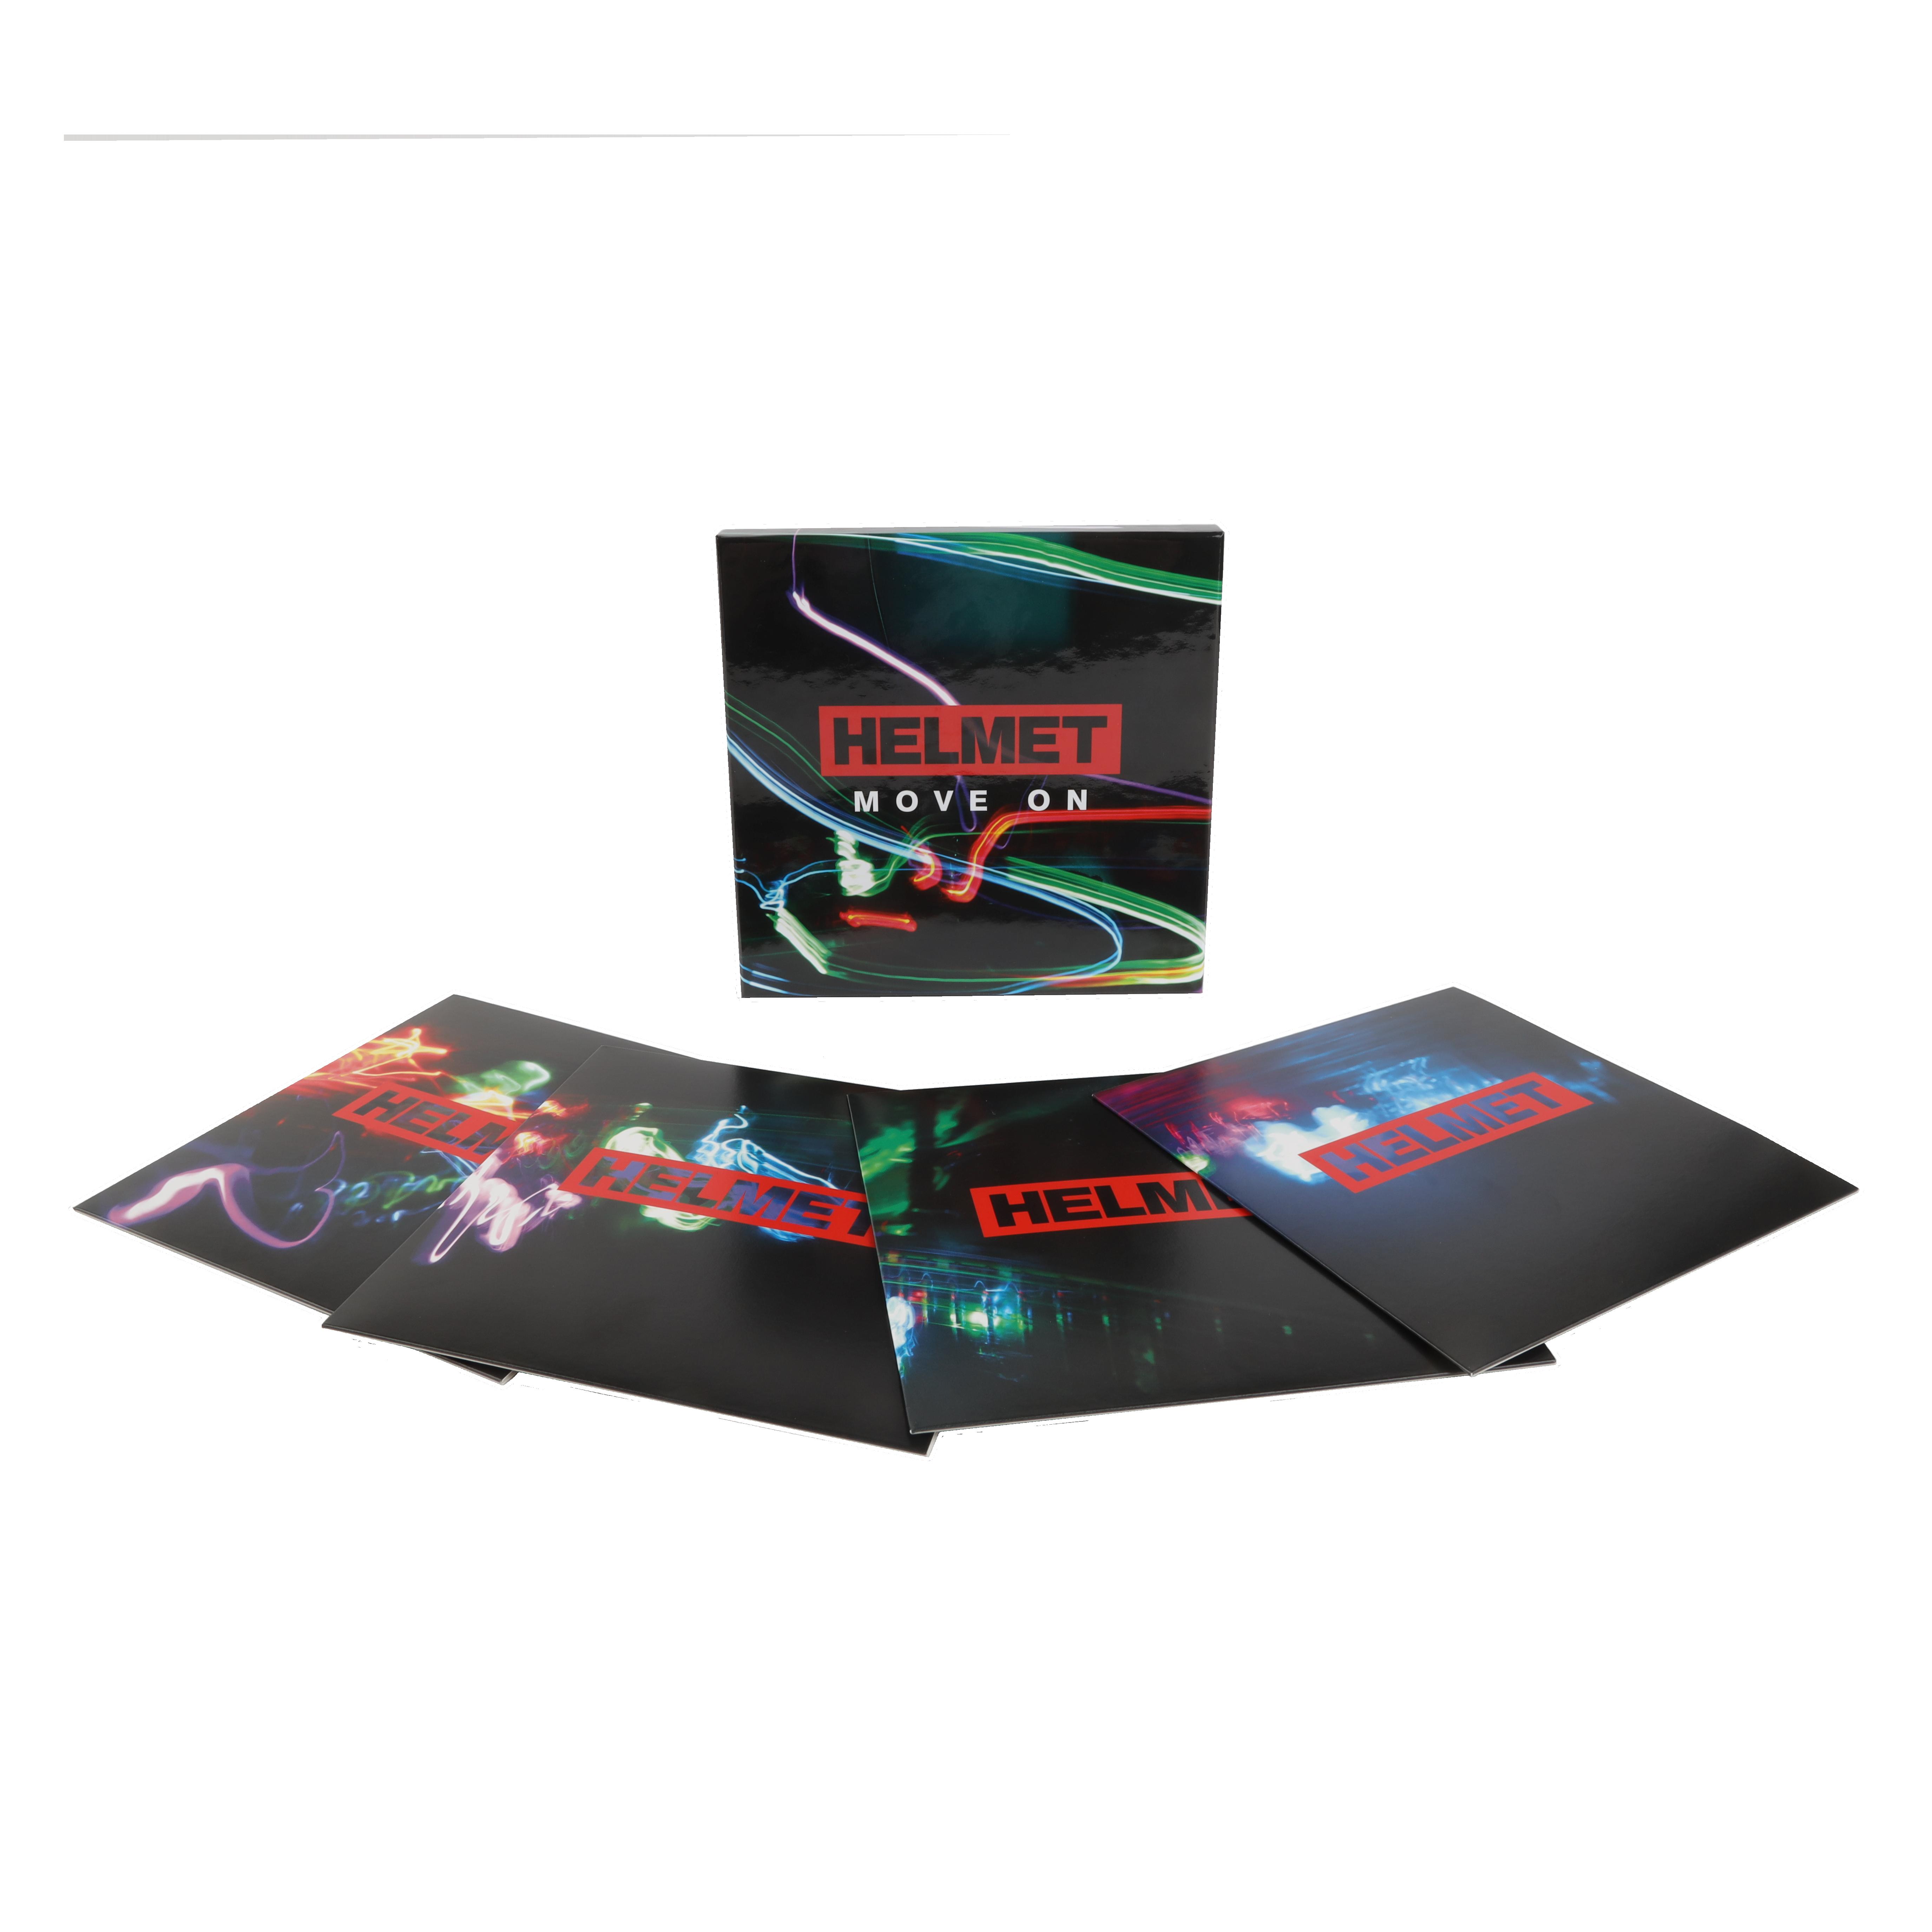 "Move On: 4 x 7"" Box Set (Limited Edition) - Helmet"